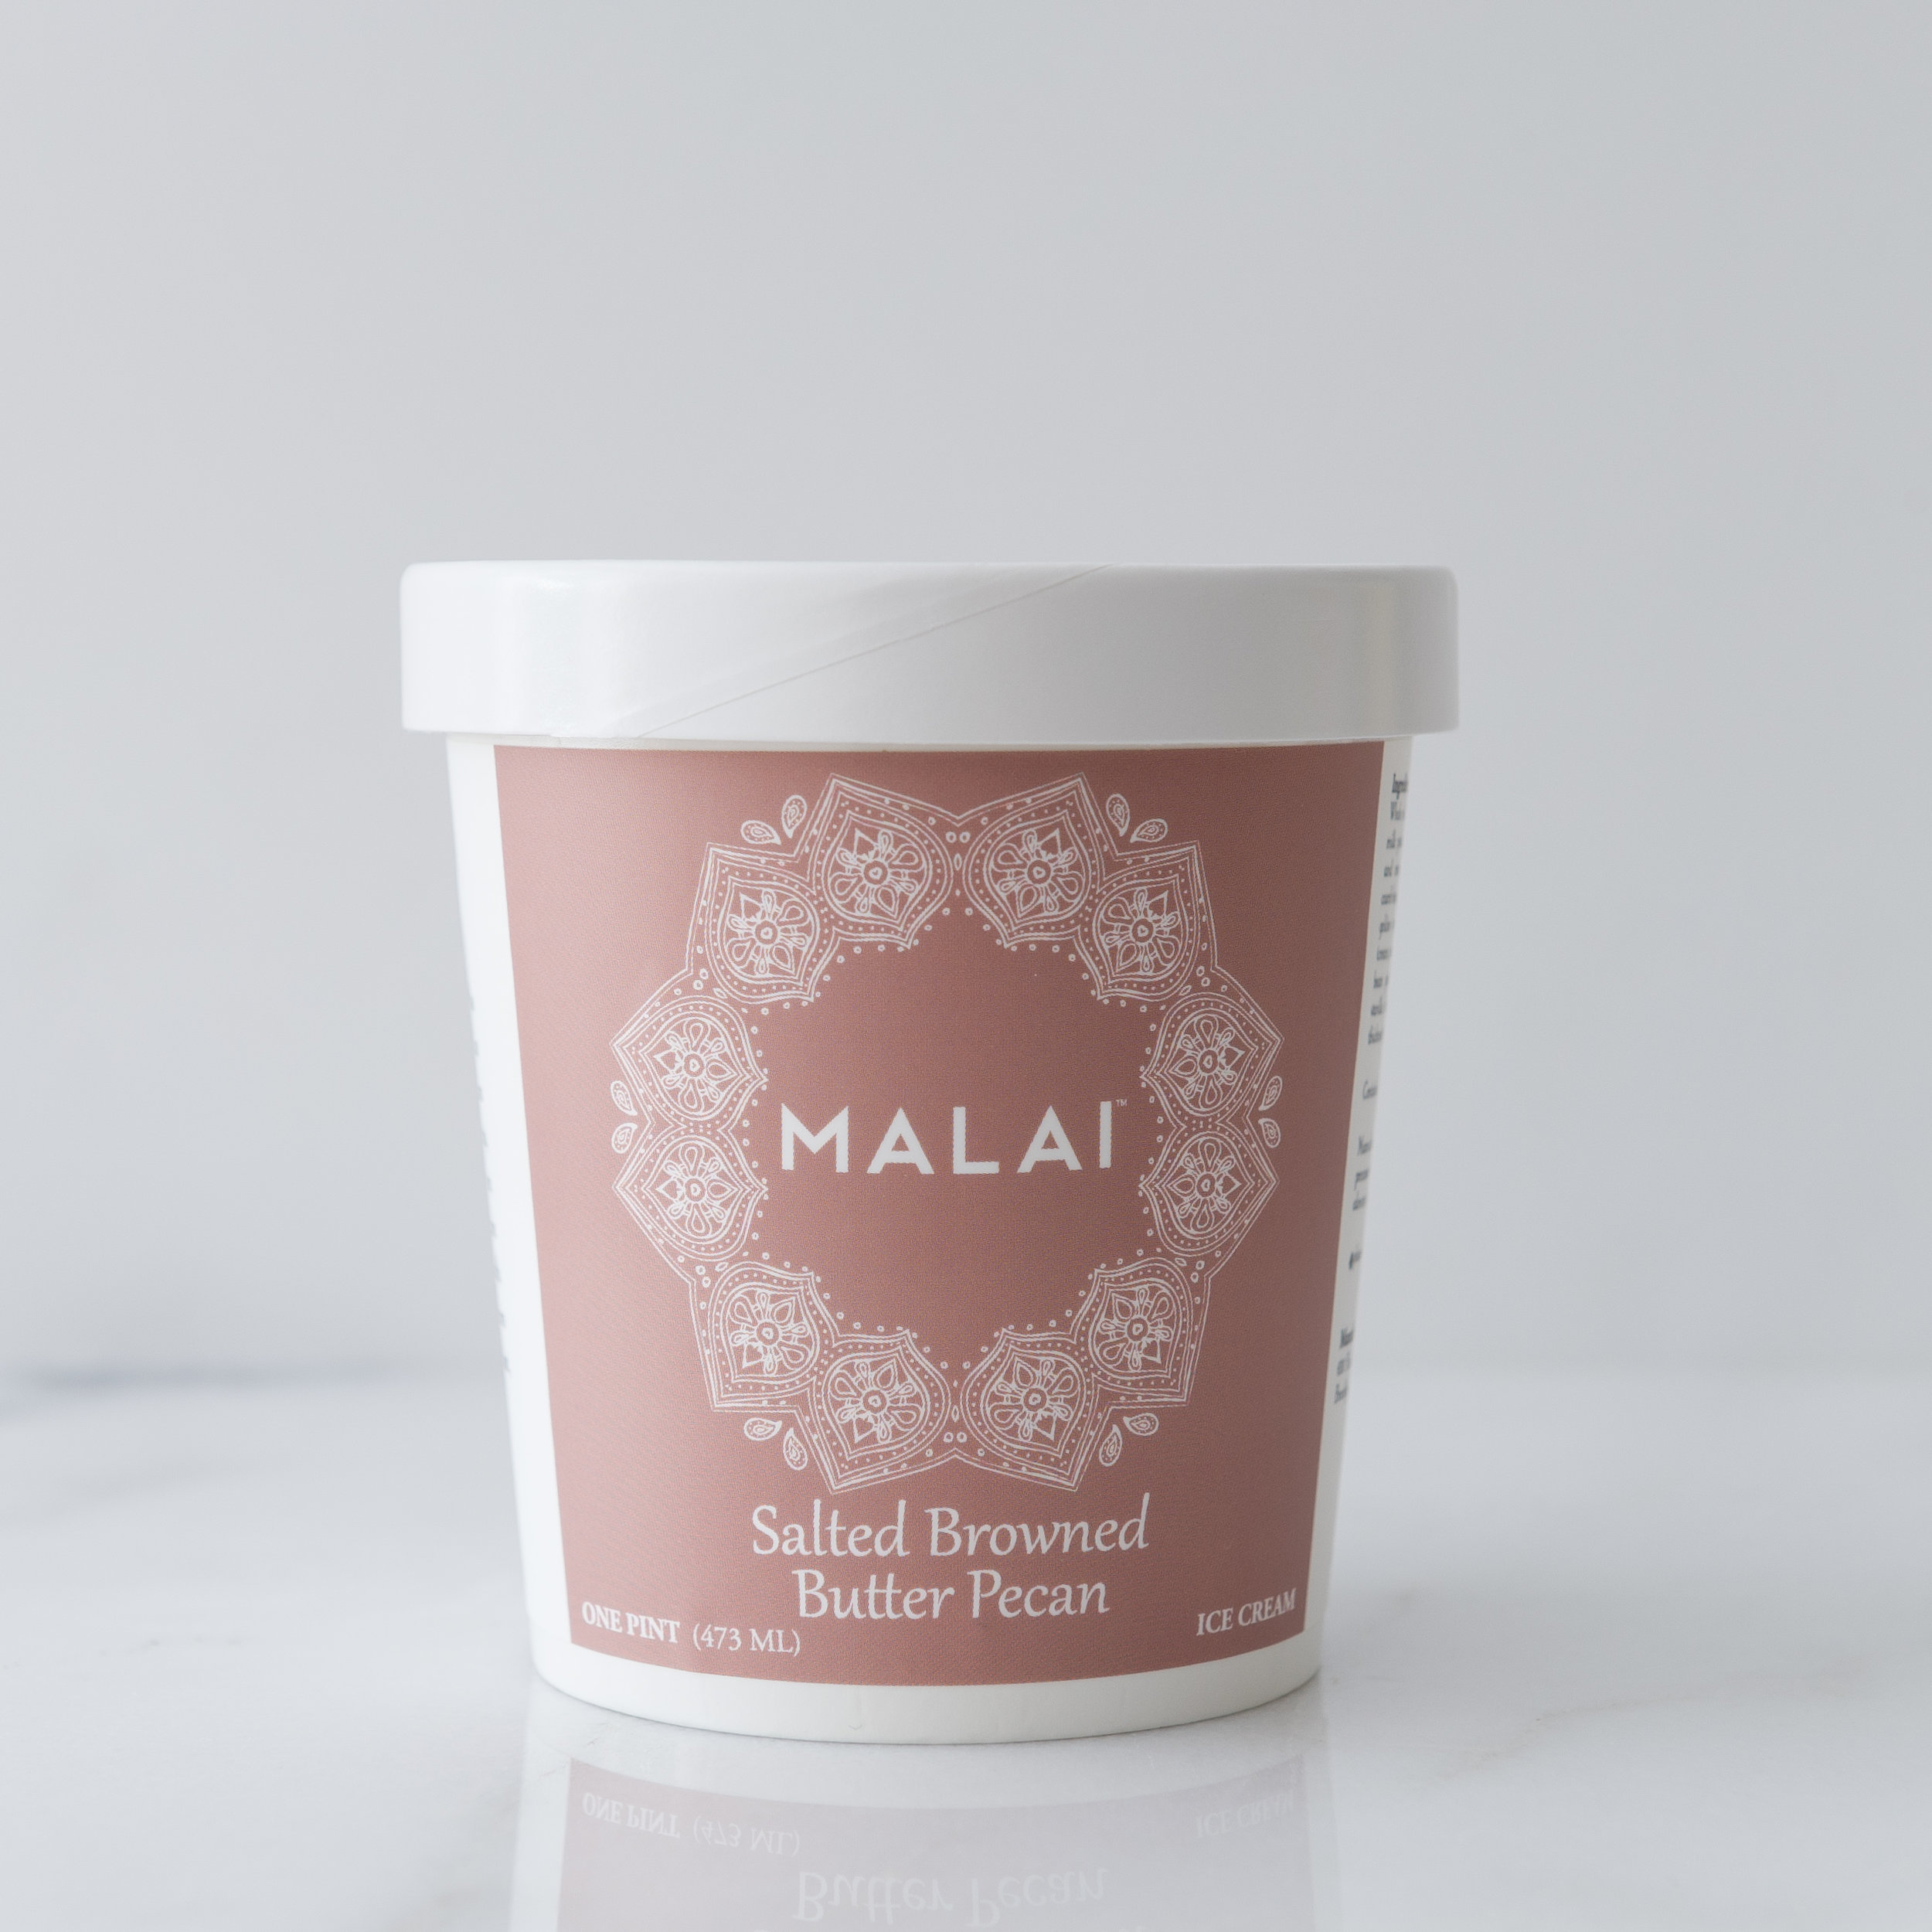 Malai_web-37.JPG